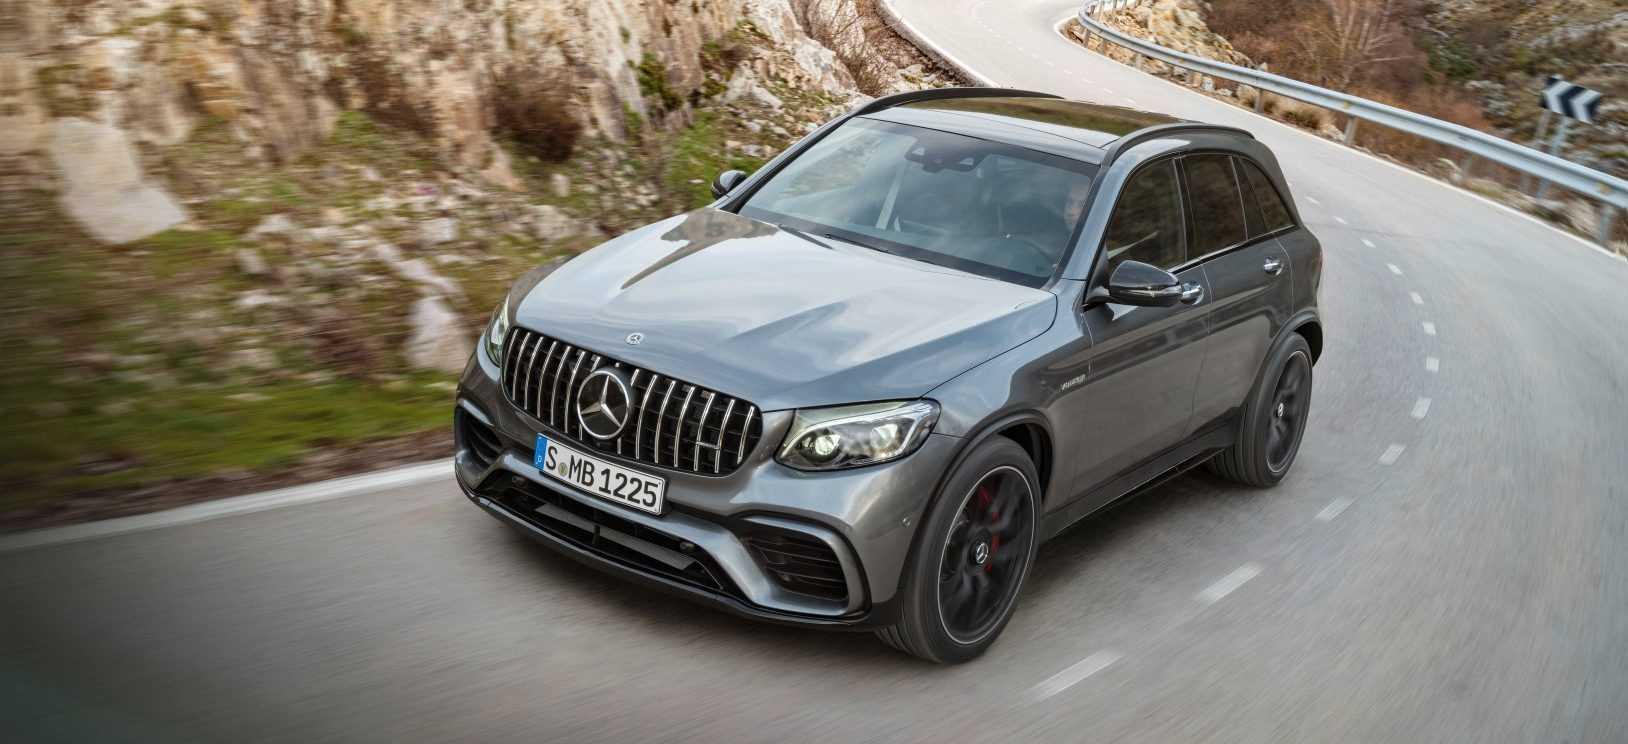 Mercedes-AMG GLC 63 4Matic+ 2017